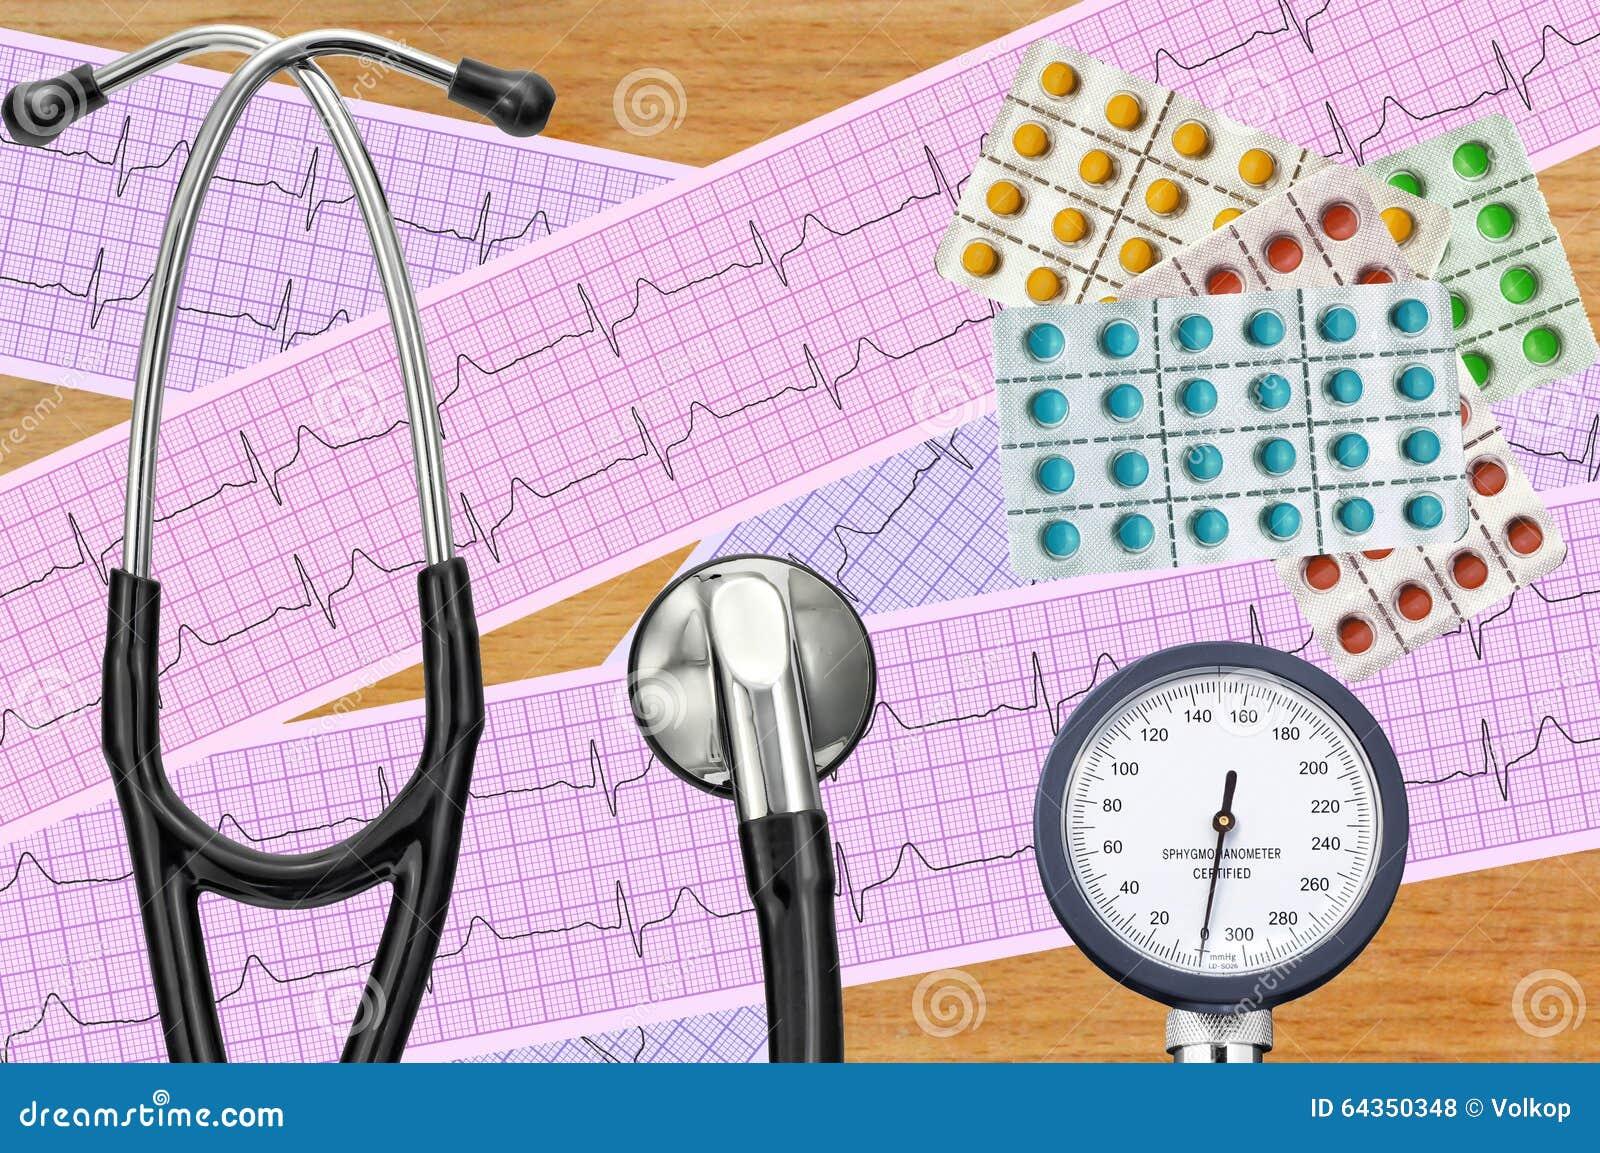 Blood pressure meter, digital tablet, pills and stethoscope